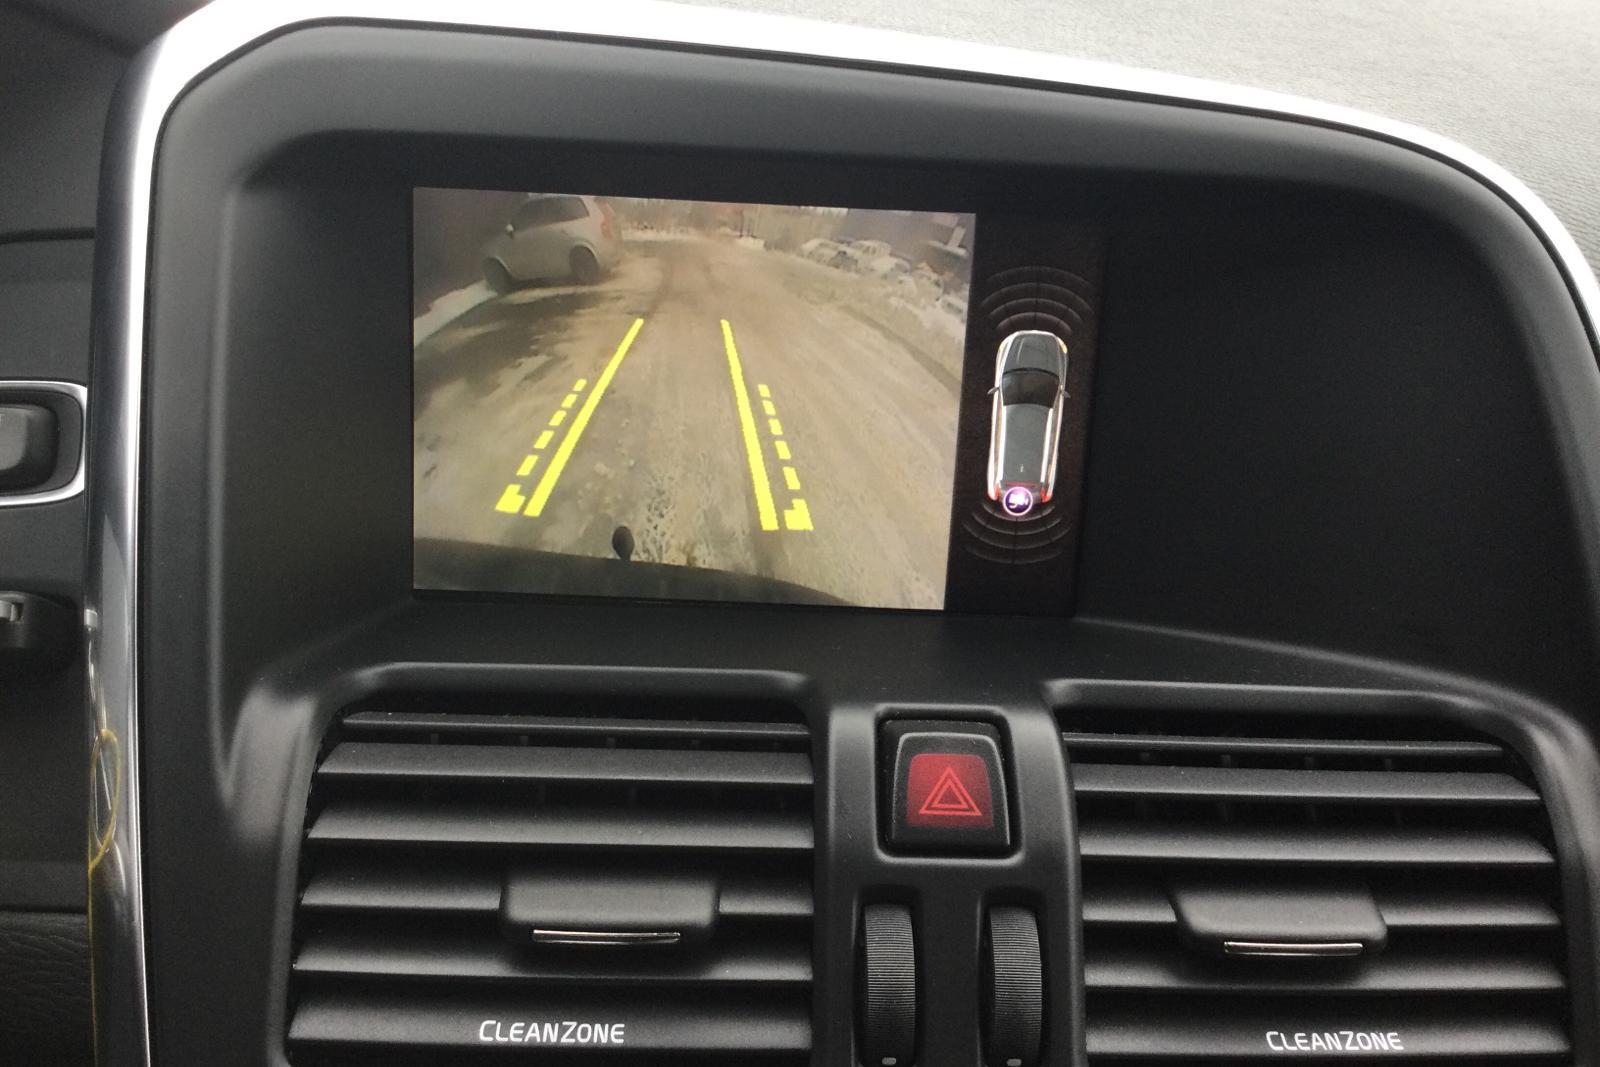 Volvo XC60 T5 2WD (245hk) - 68 790 km - Automatic - gray - 2017